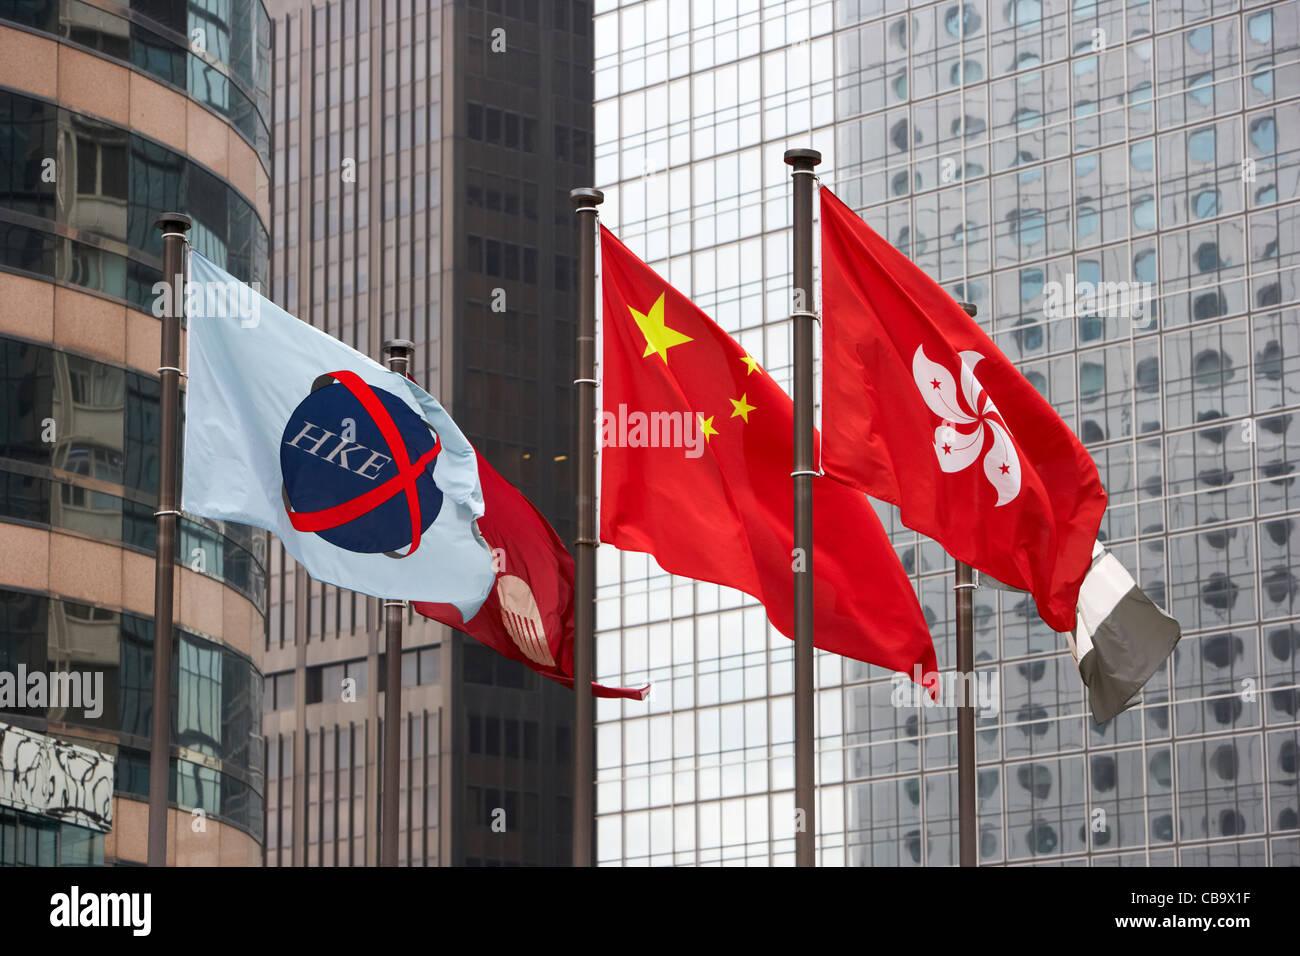 tecnologie sofisticate consistenza netta design di qualità Borsa di Hong kong e cina hong kong bandiere exchange square ...